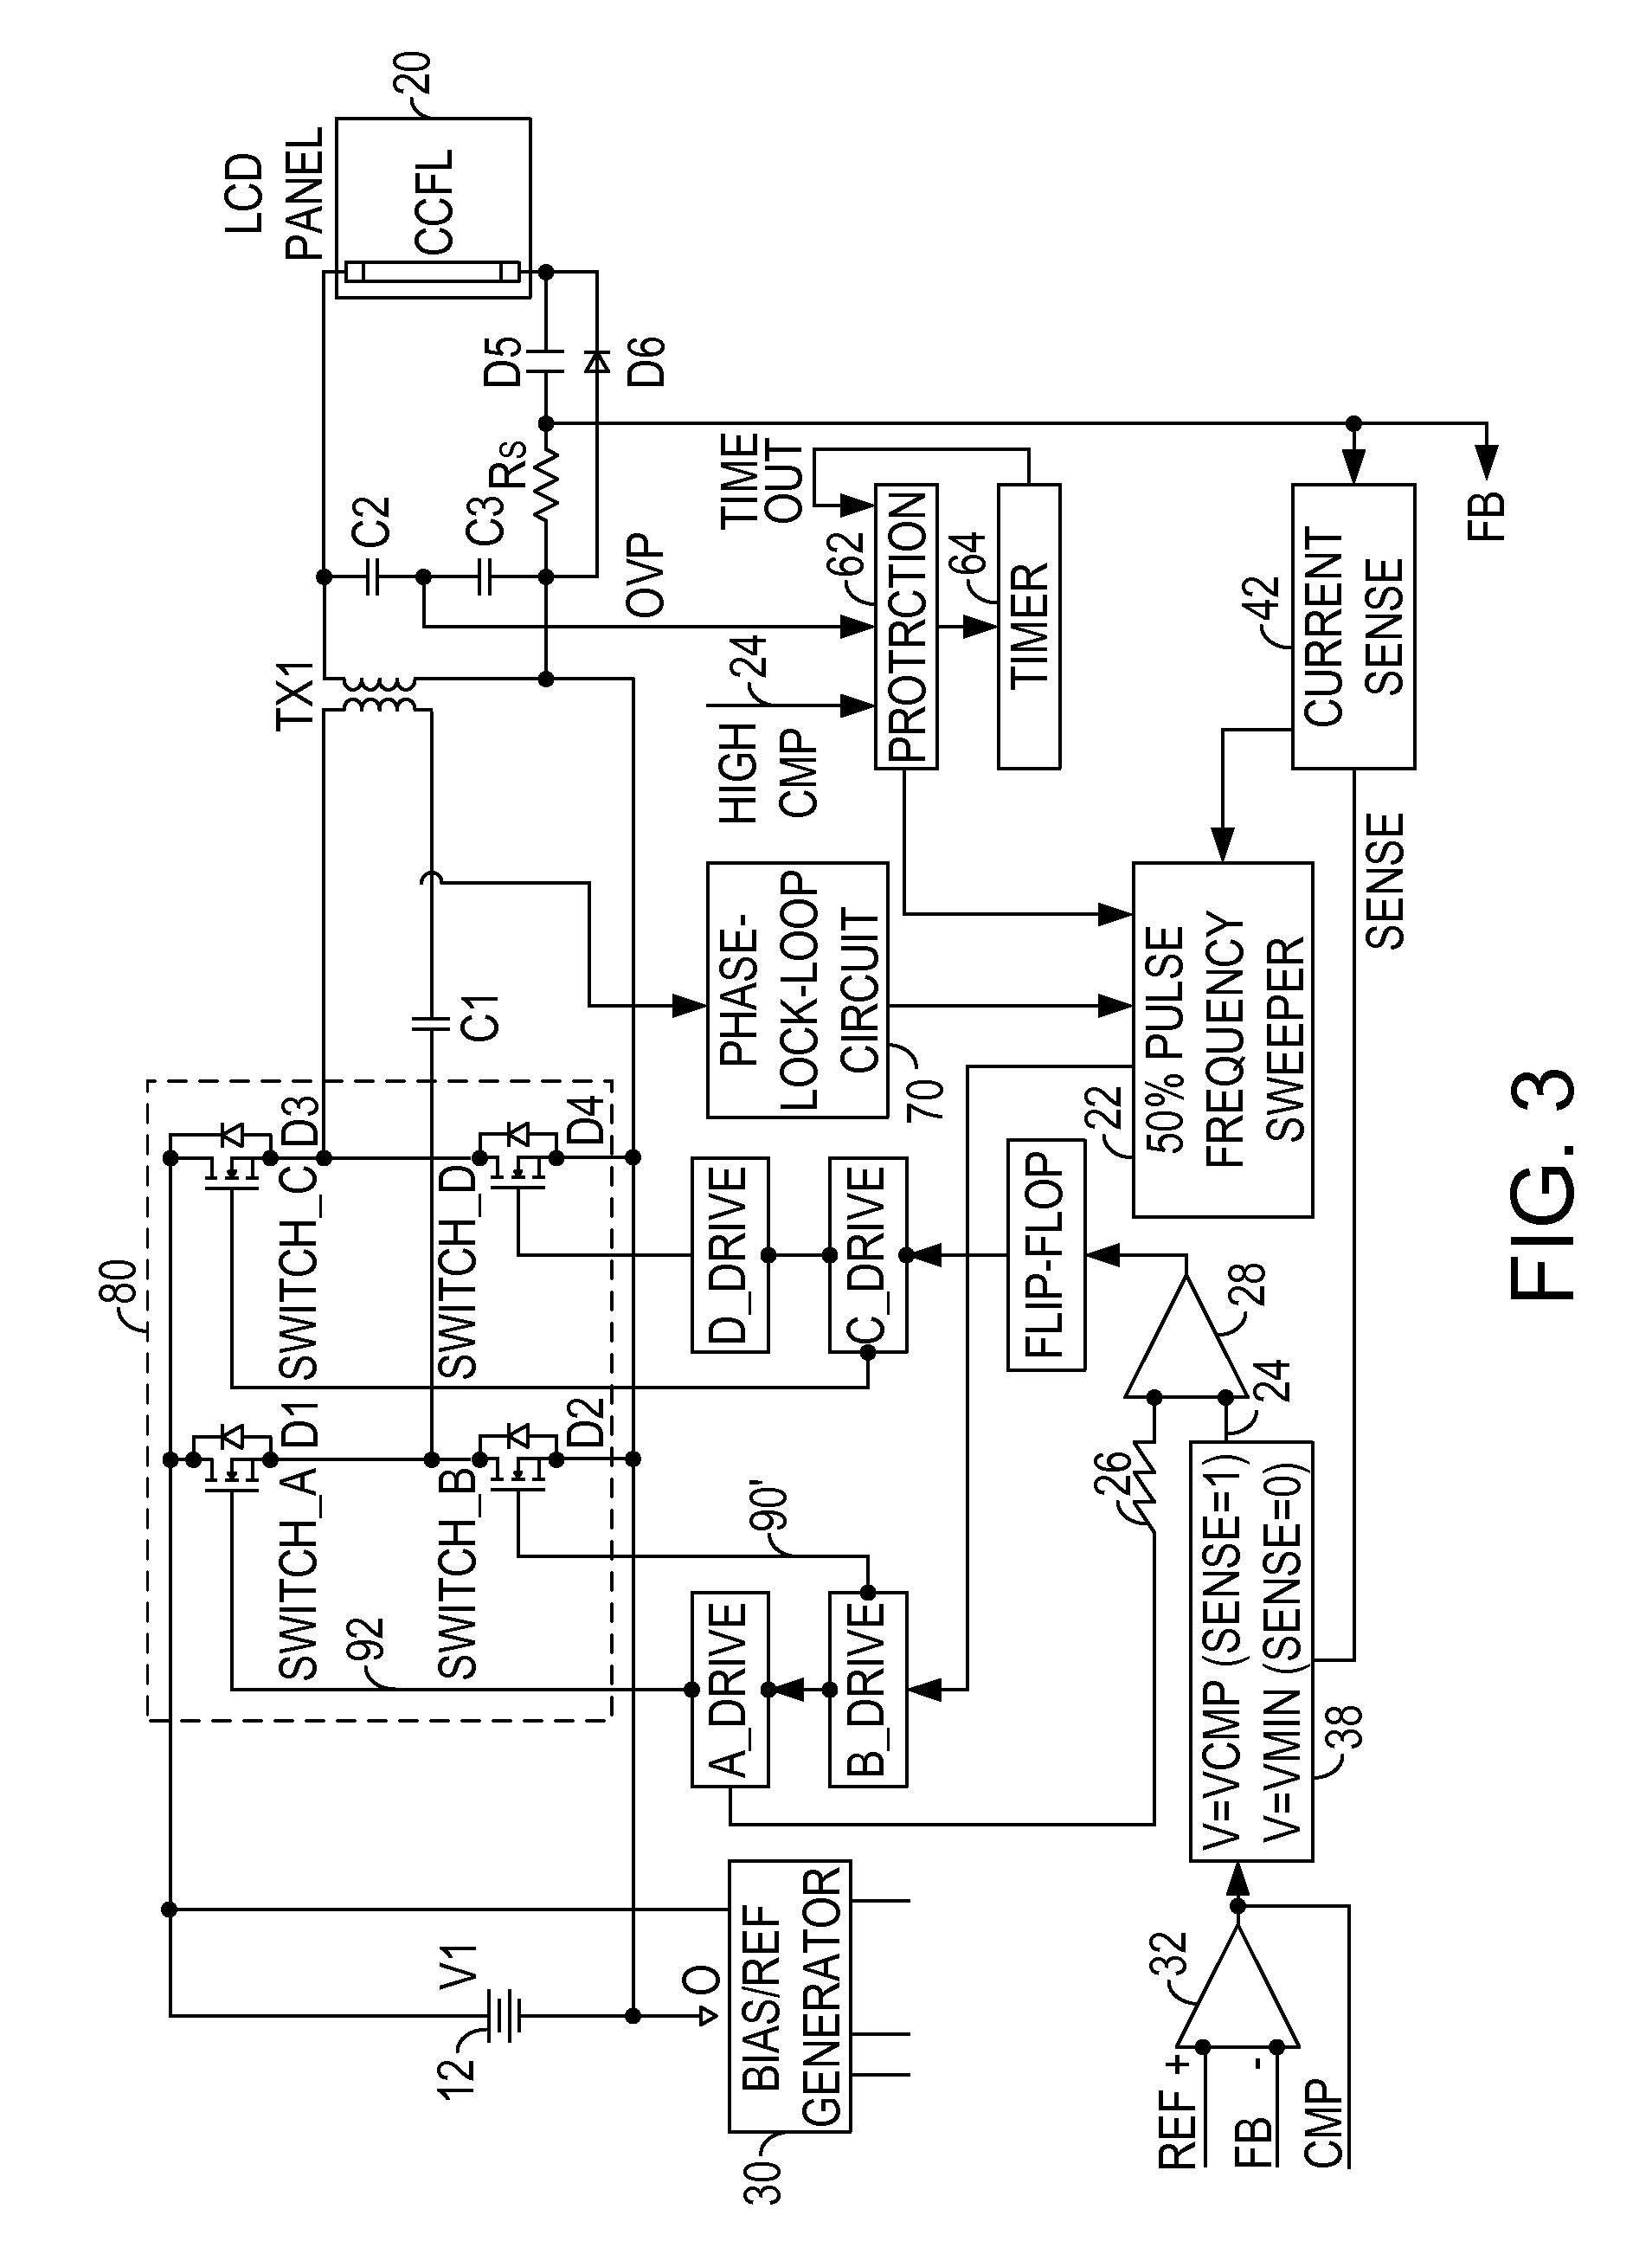 2014 fj cruiser wiring diagram